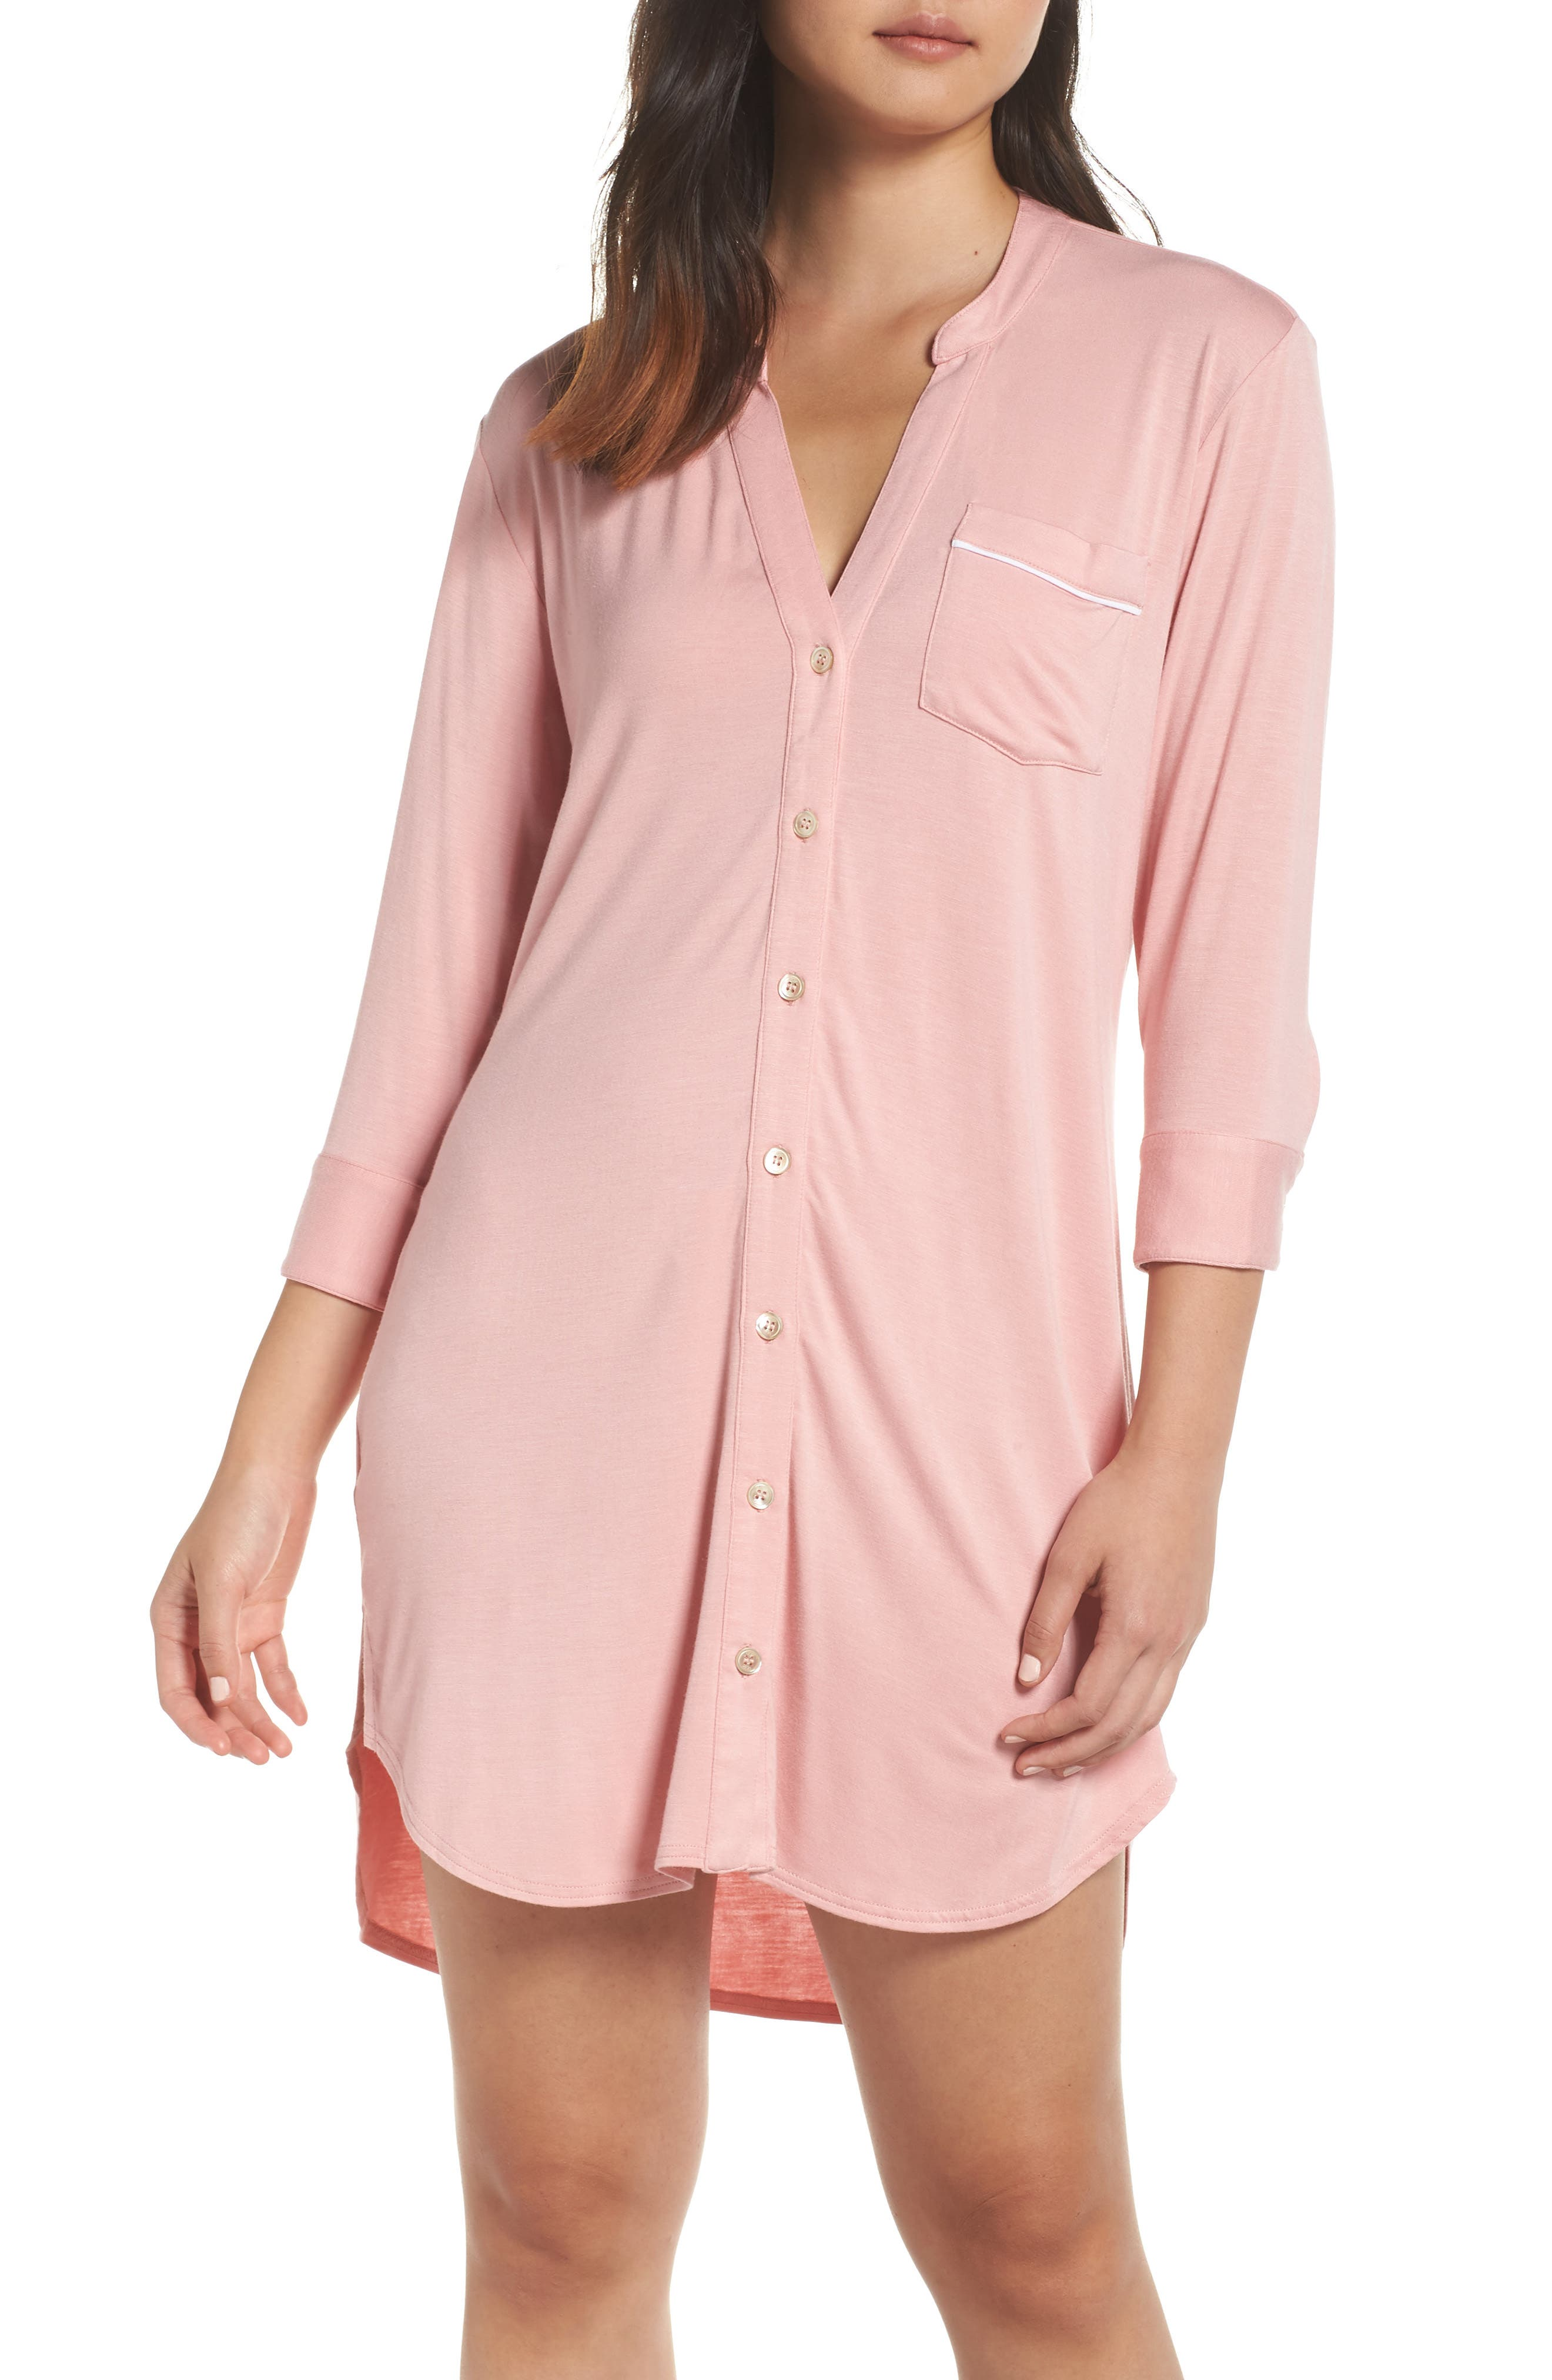 Vivian Jersey Sleepshirt in Pink Dawn